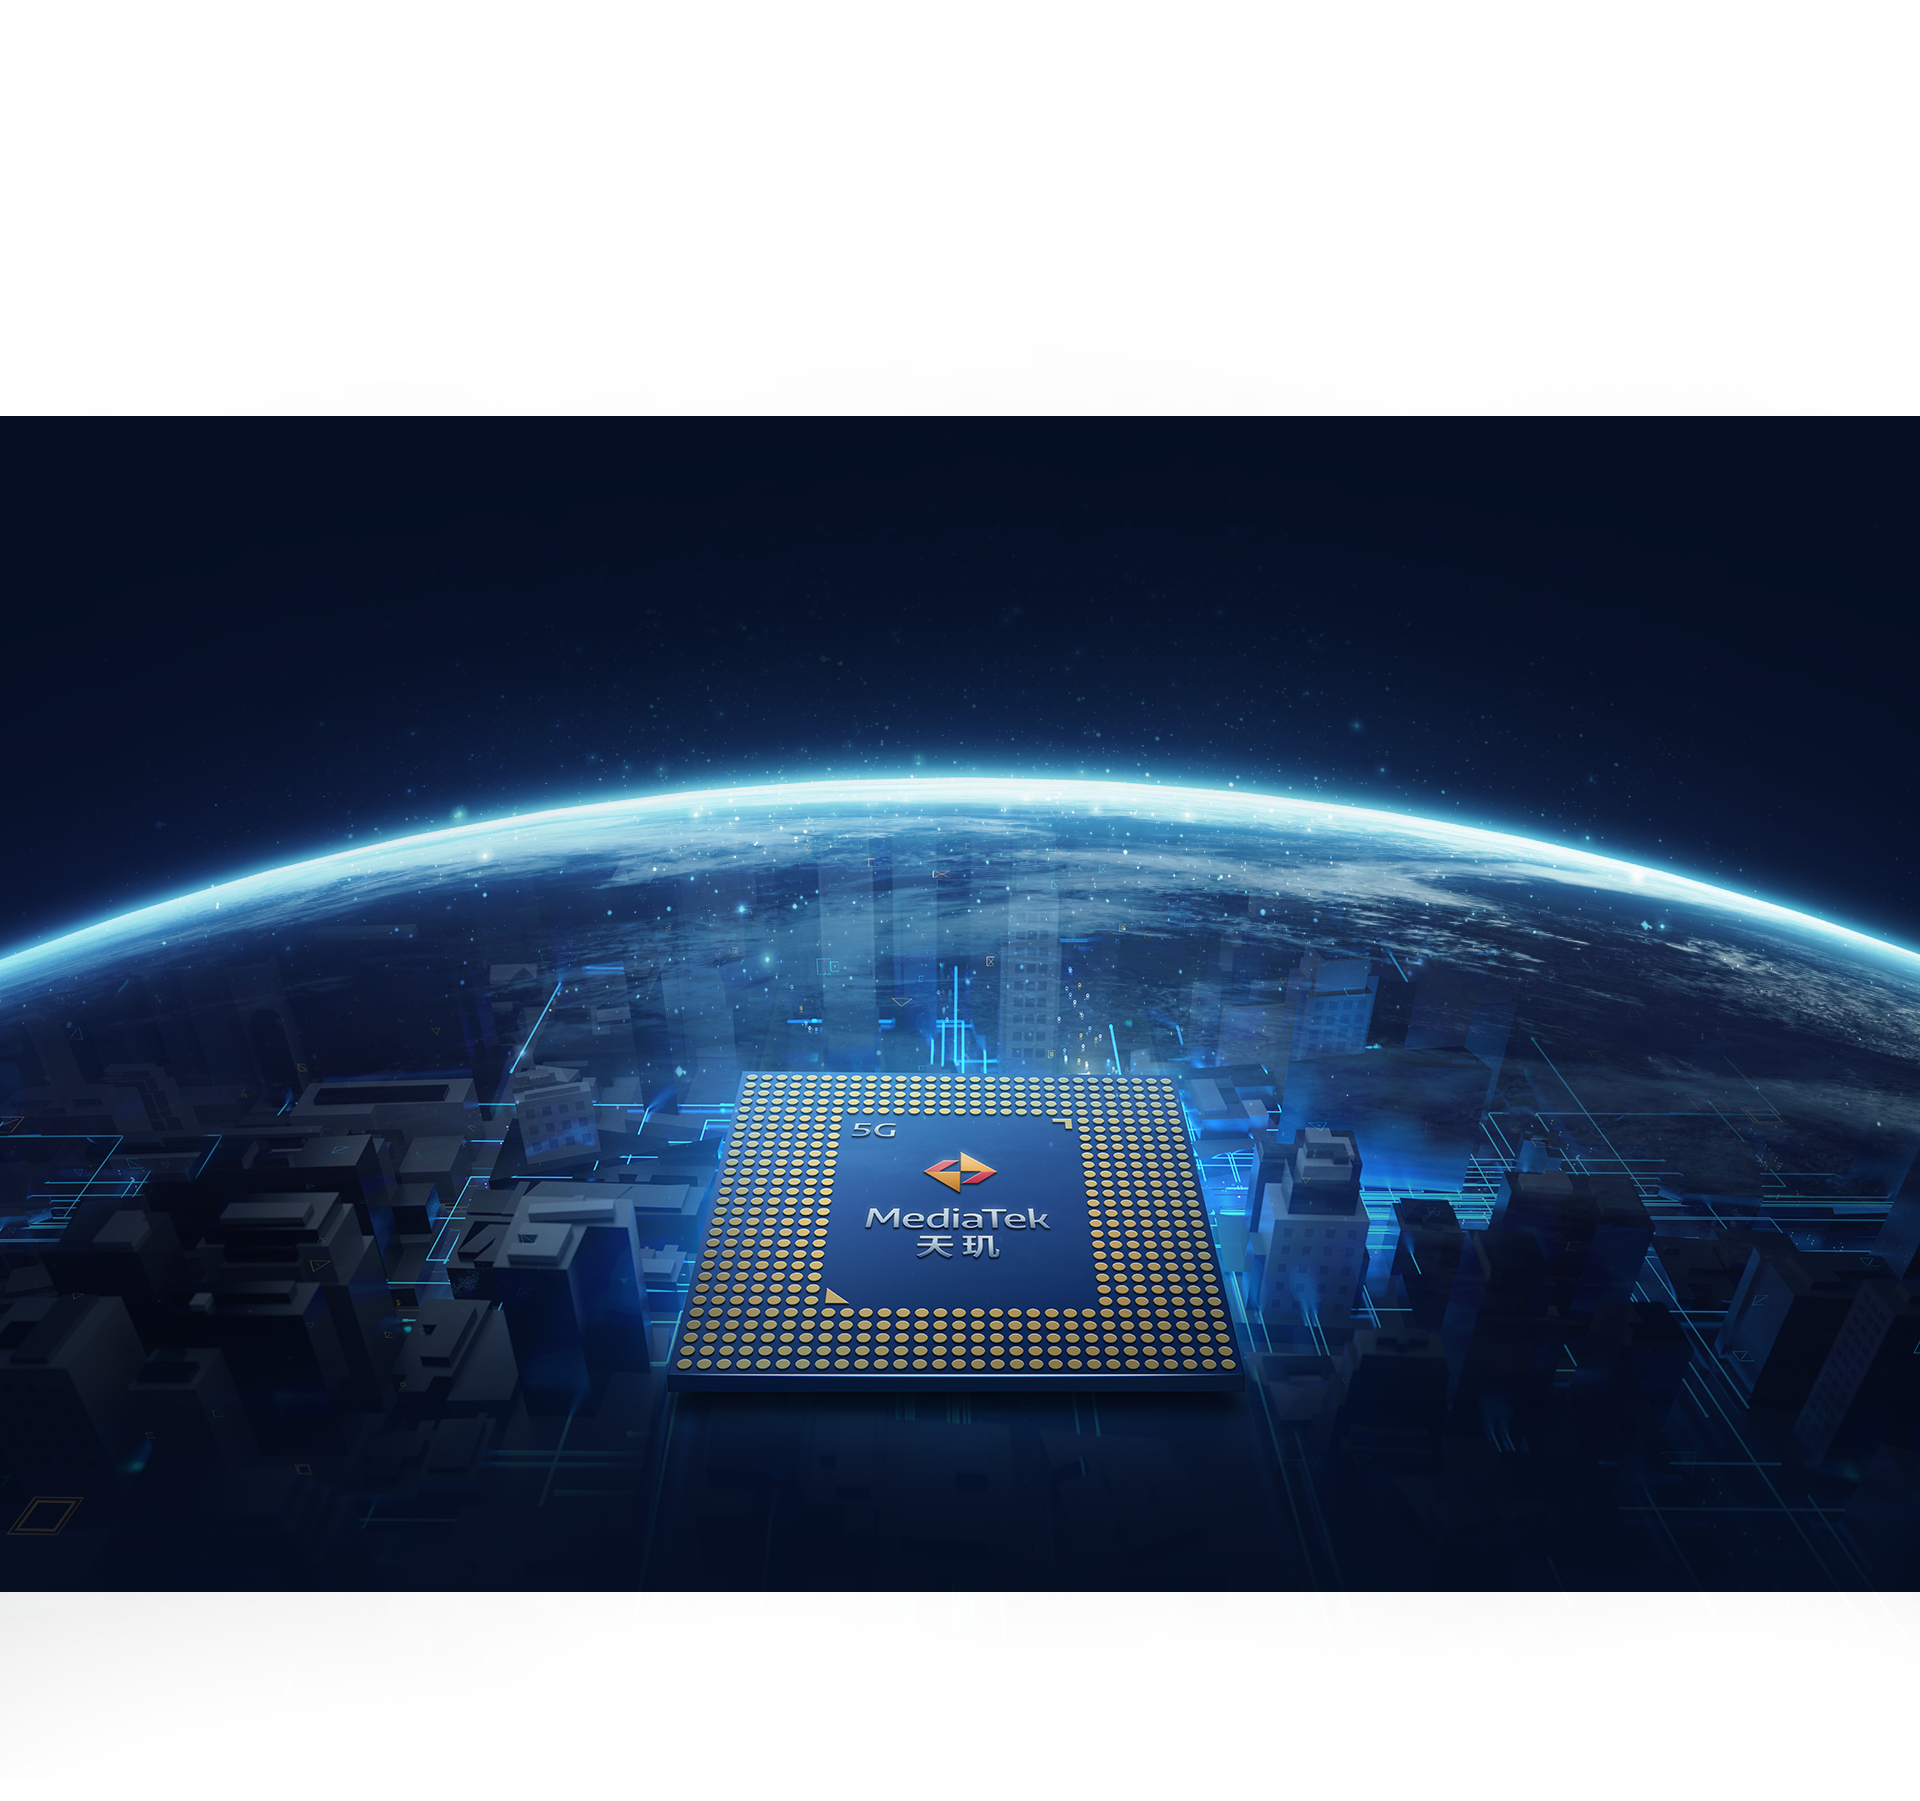 Dimensity – MediaTek's Flagship 5G SoC's